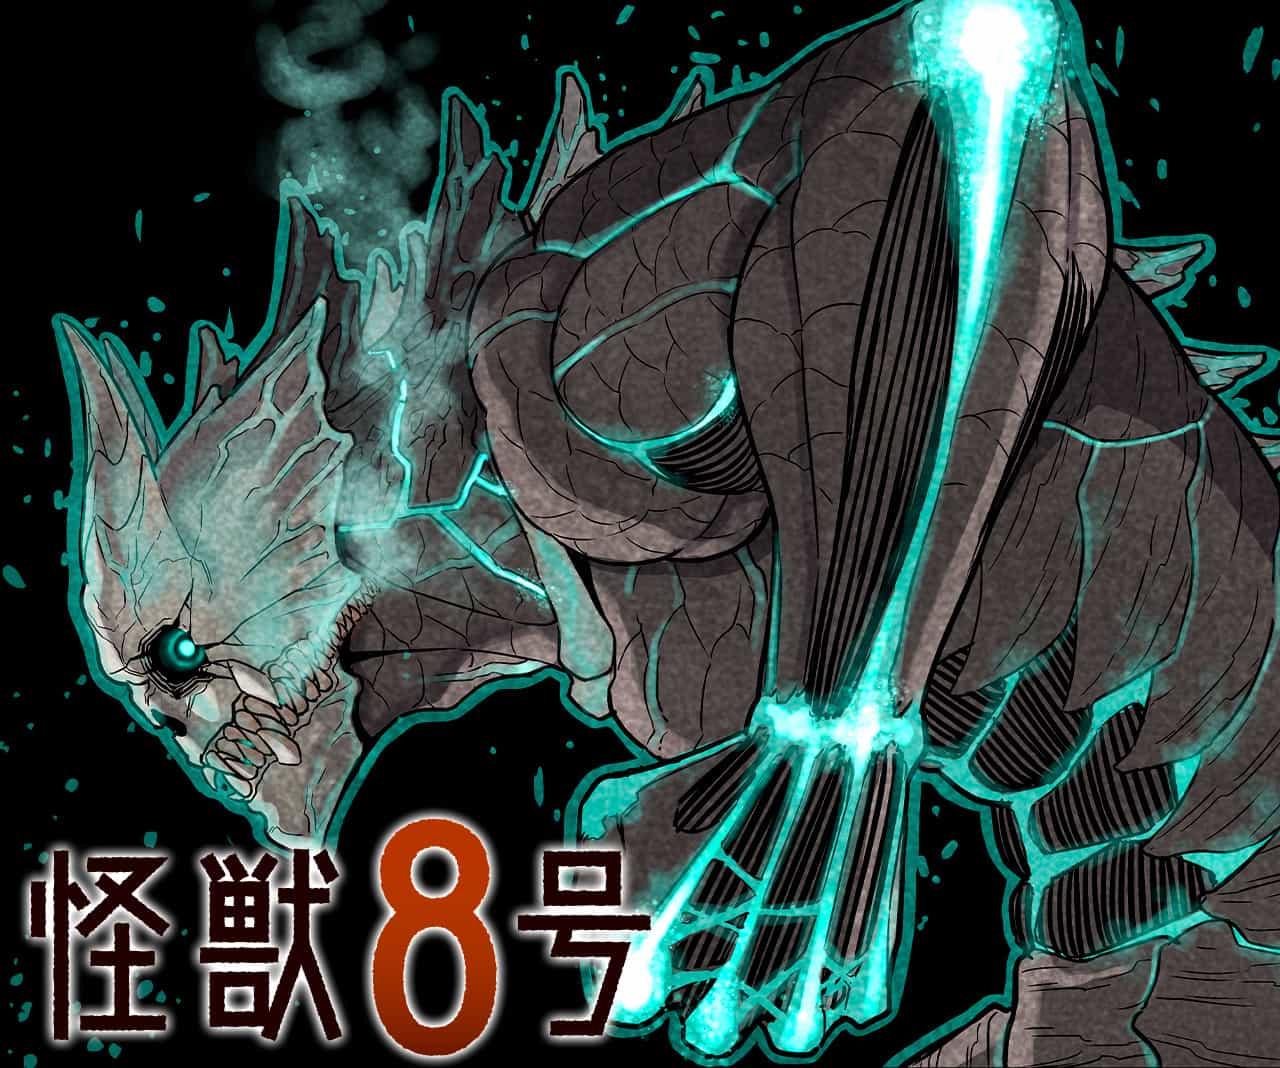 Review Monster #8, Kaijuu no. 8 Bahasa Indonesia